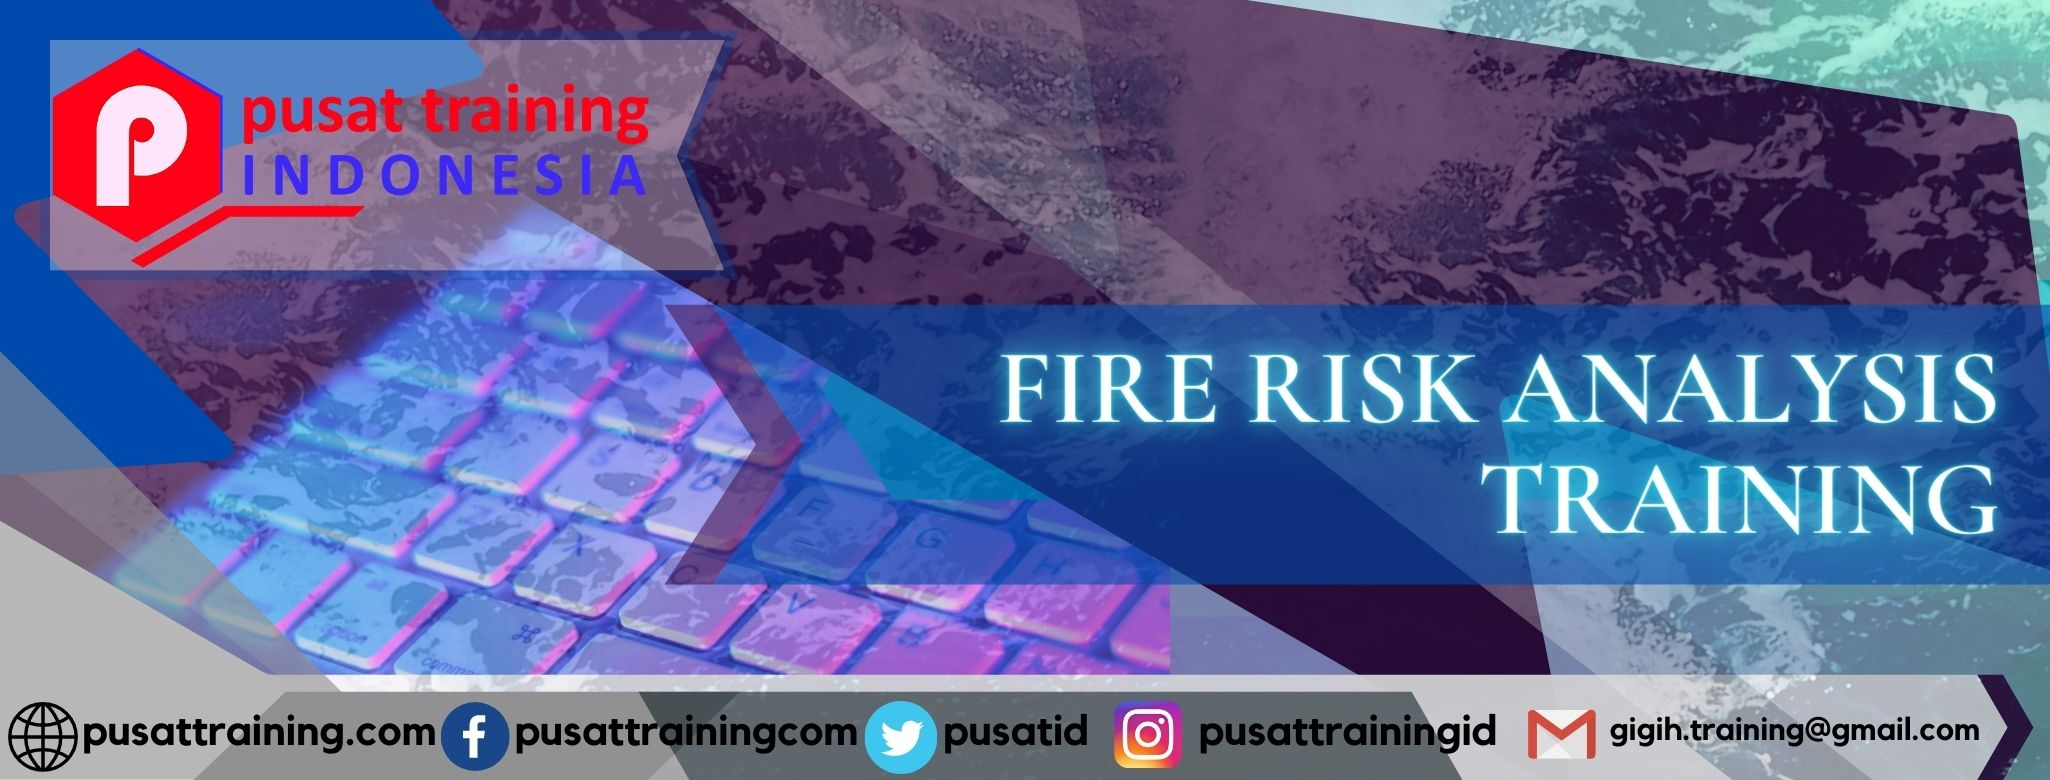 FIRE RISK ANALYSIS TRAINING